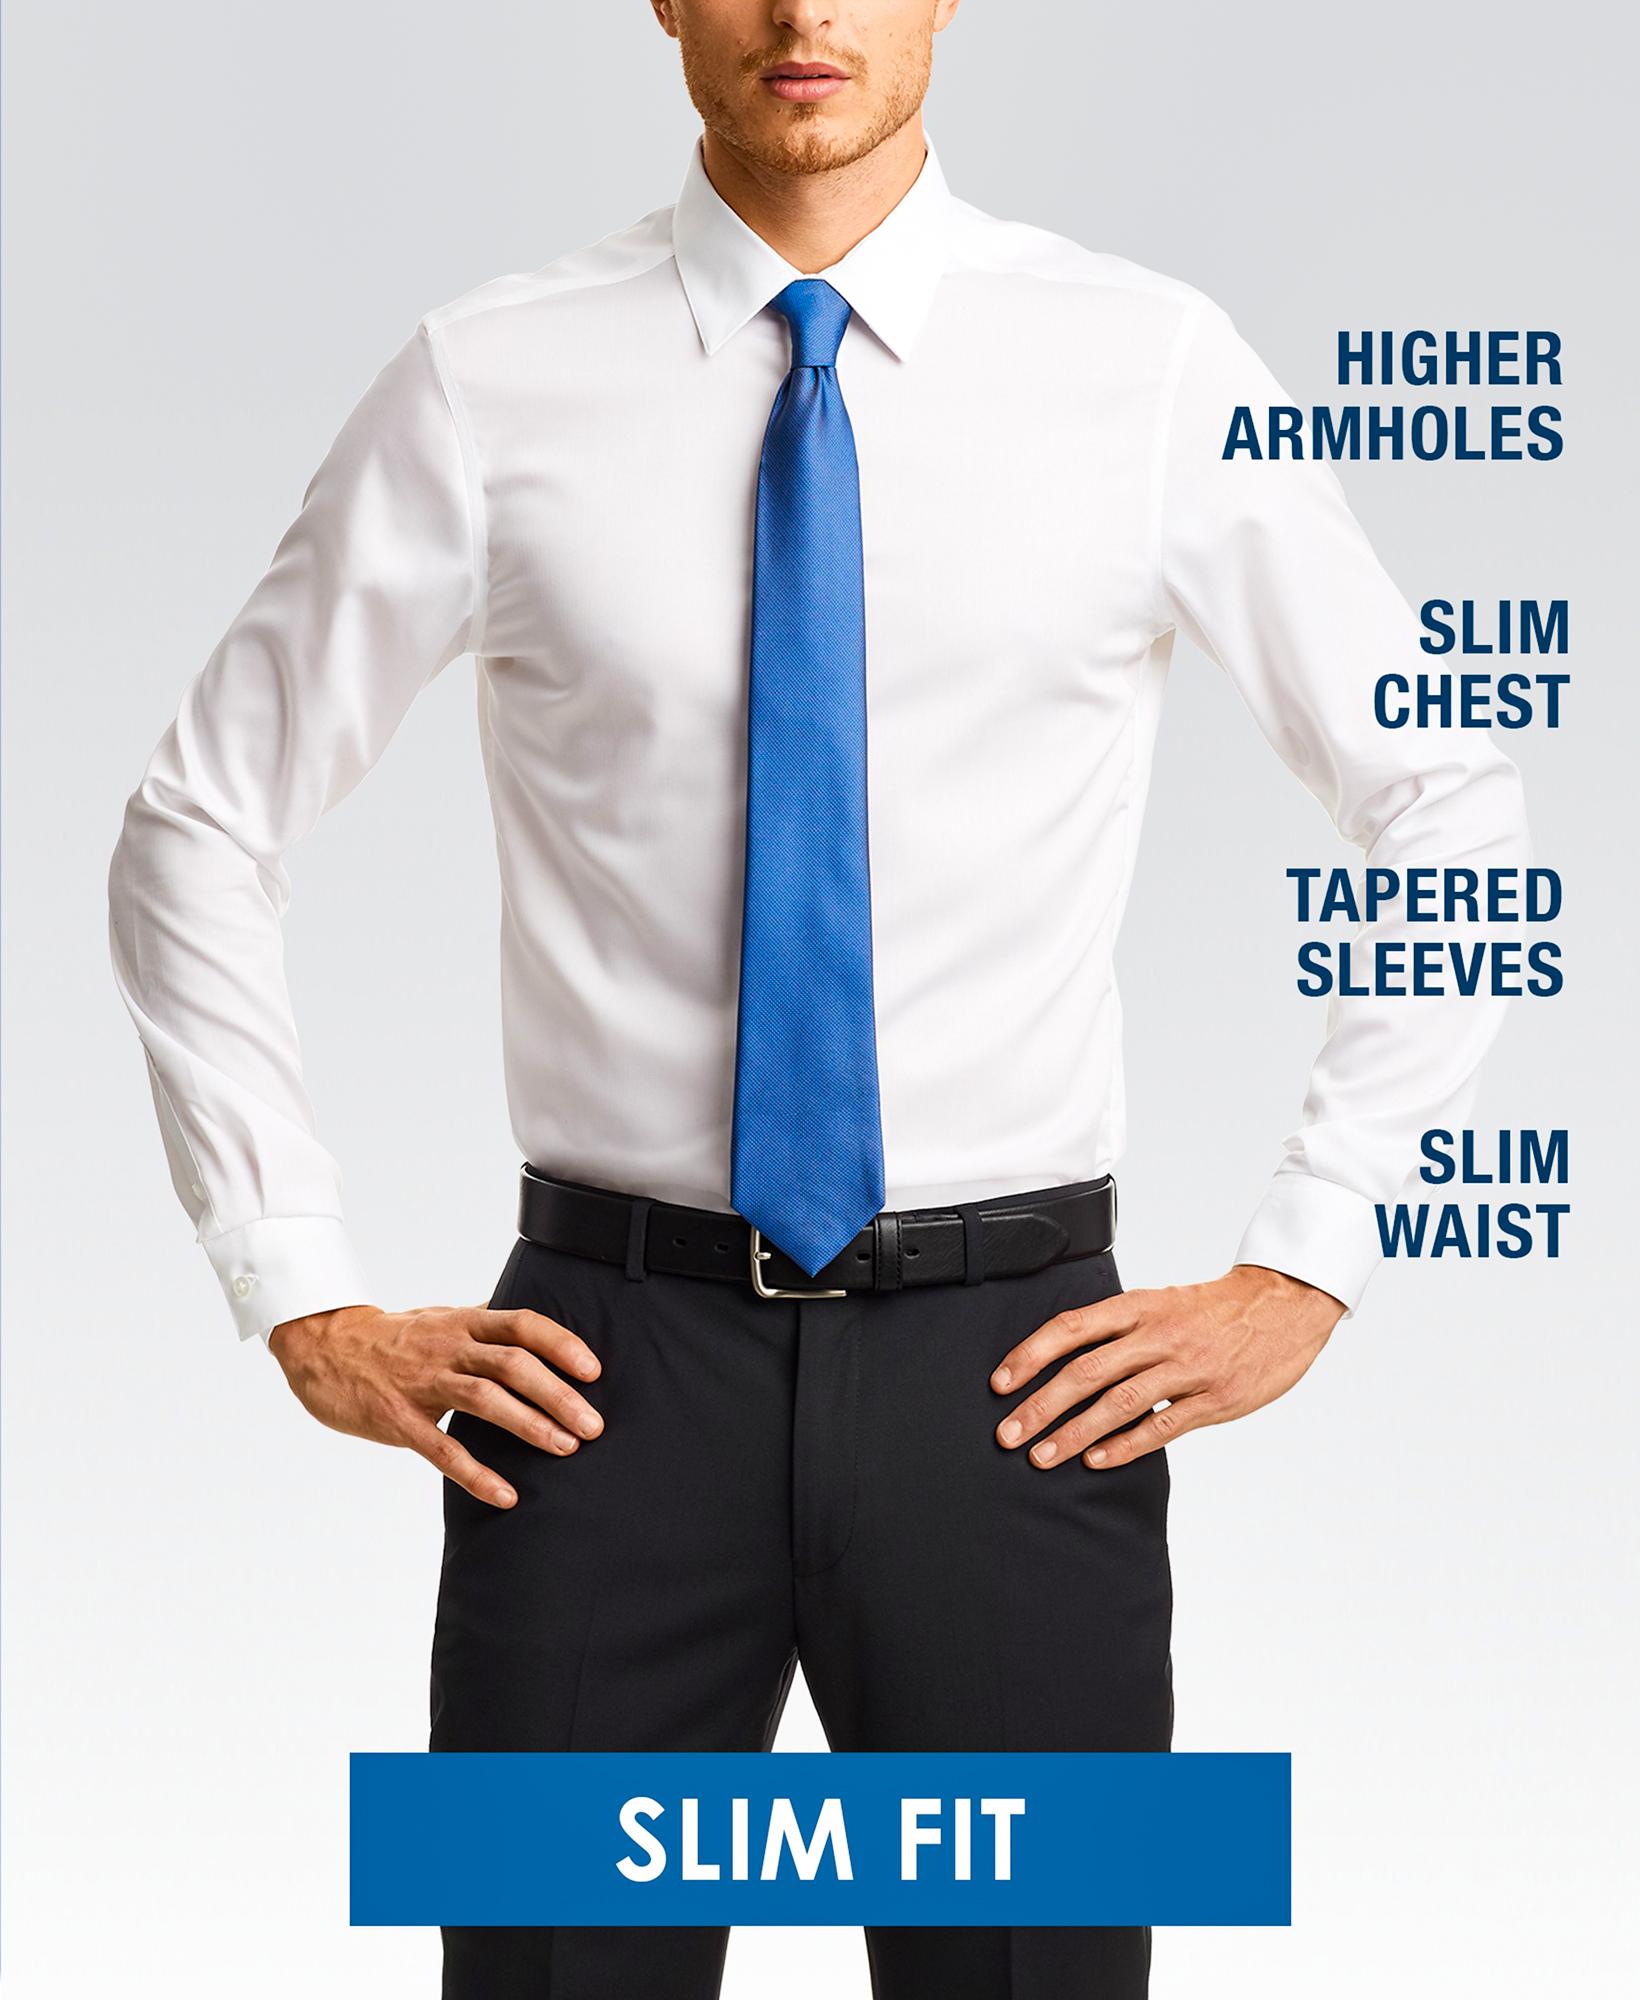 Slim fit dress shirt style